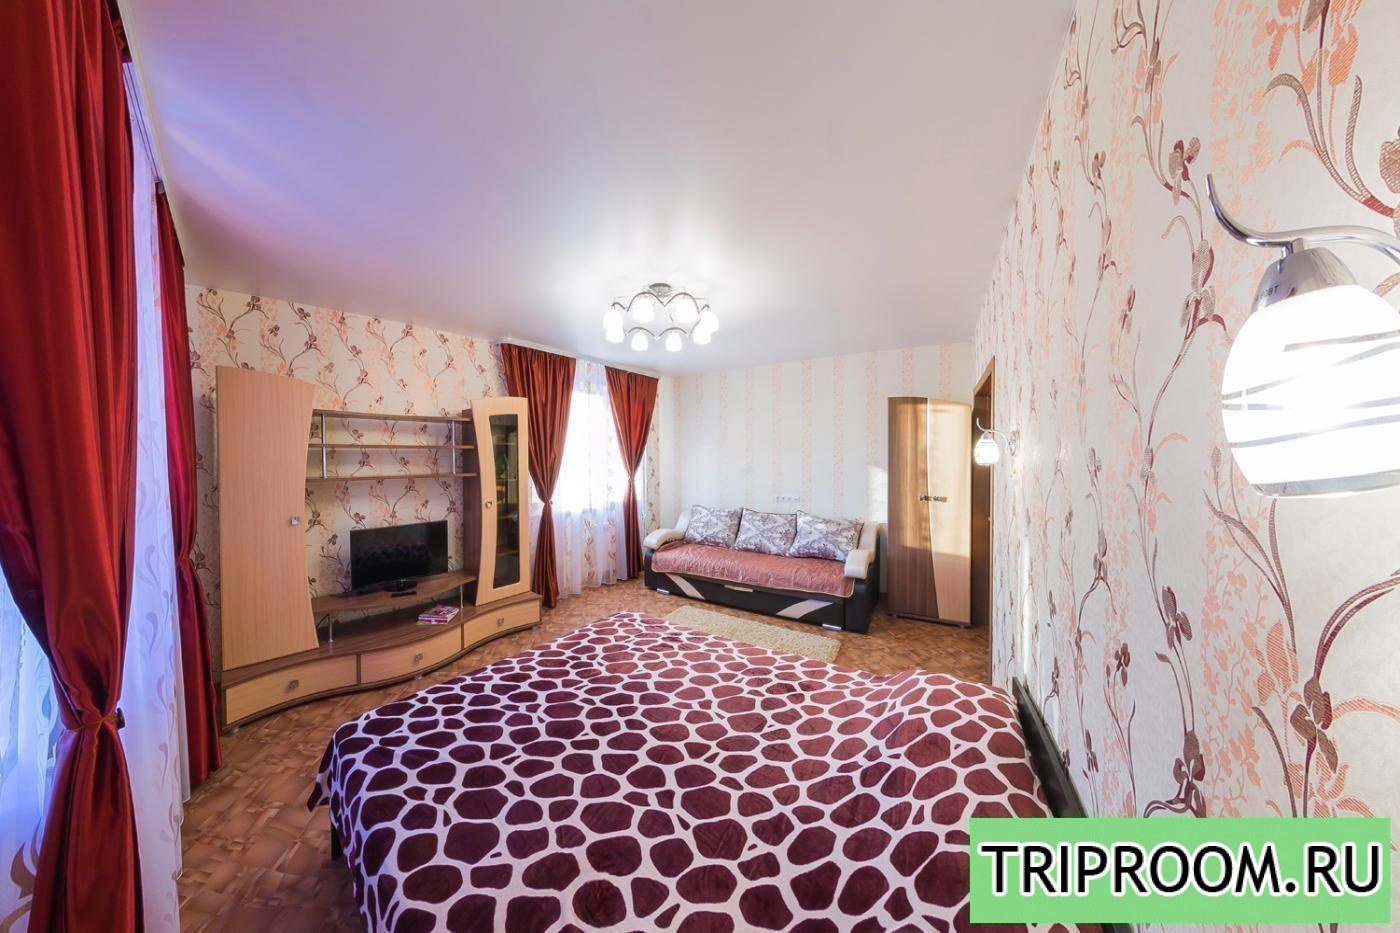 1-комнатная квартира посуточно (вариант № 17182), ул. Костычева улица, фото № 1